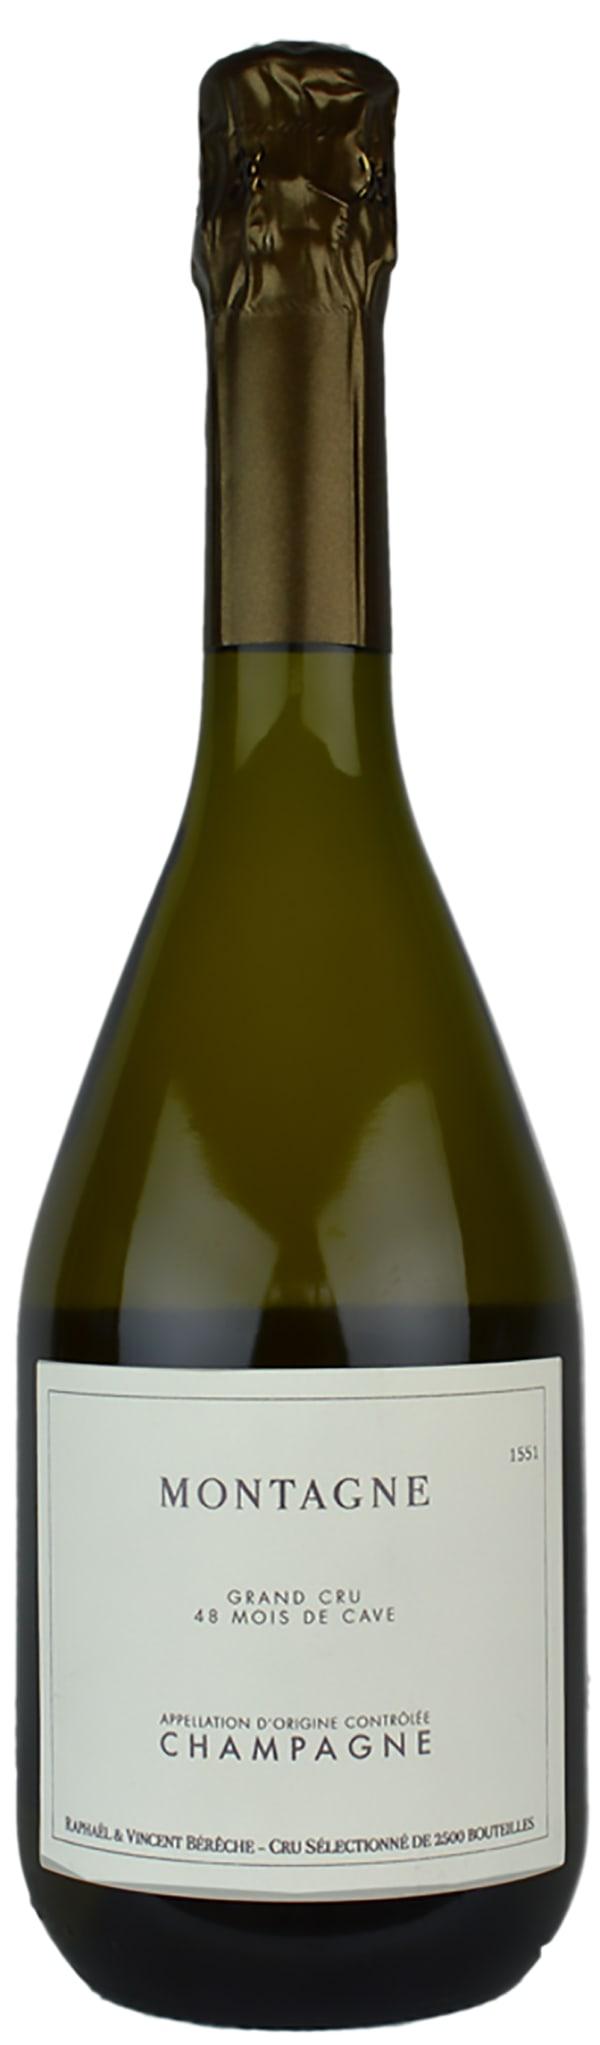 Bérèche Montagne Verzenay Grand Cru Champagne Extra Brut